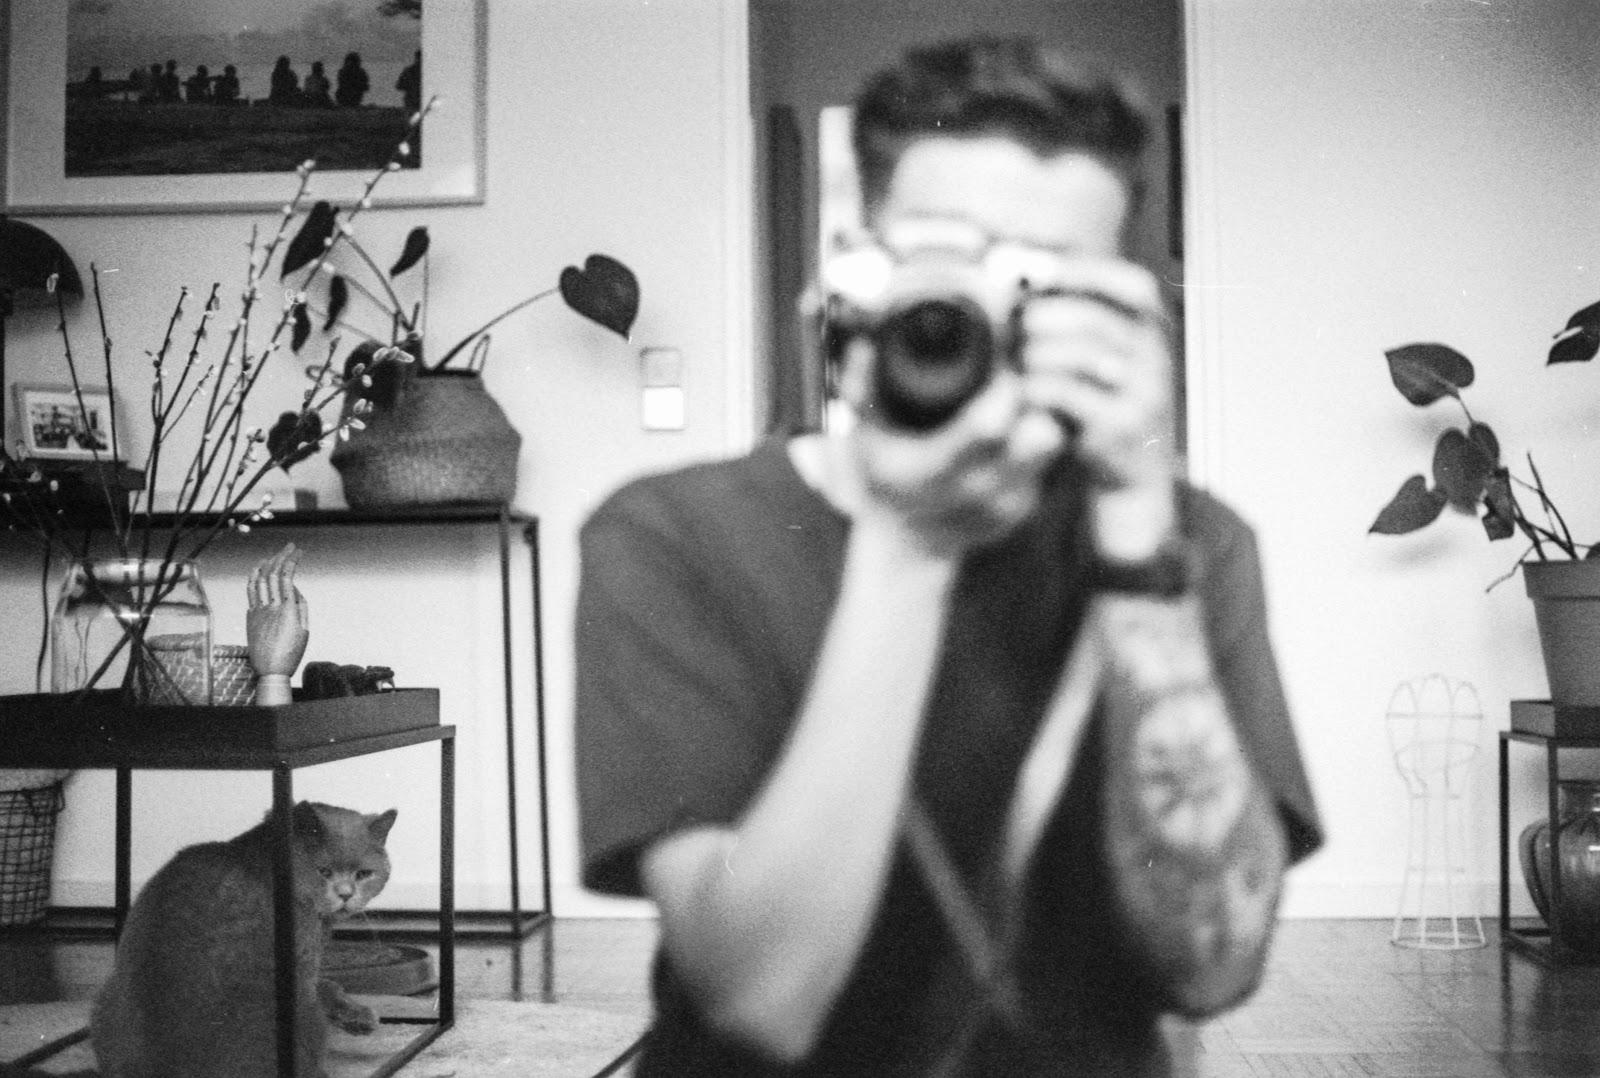 mirror selfie poses for men